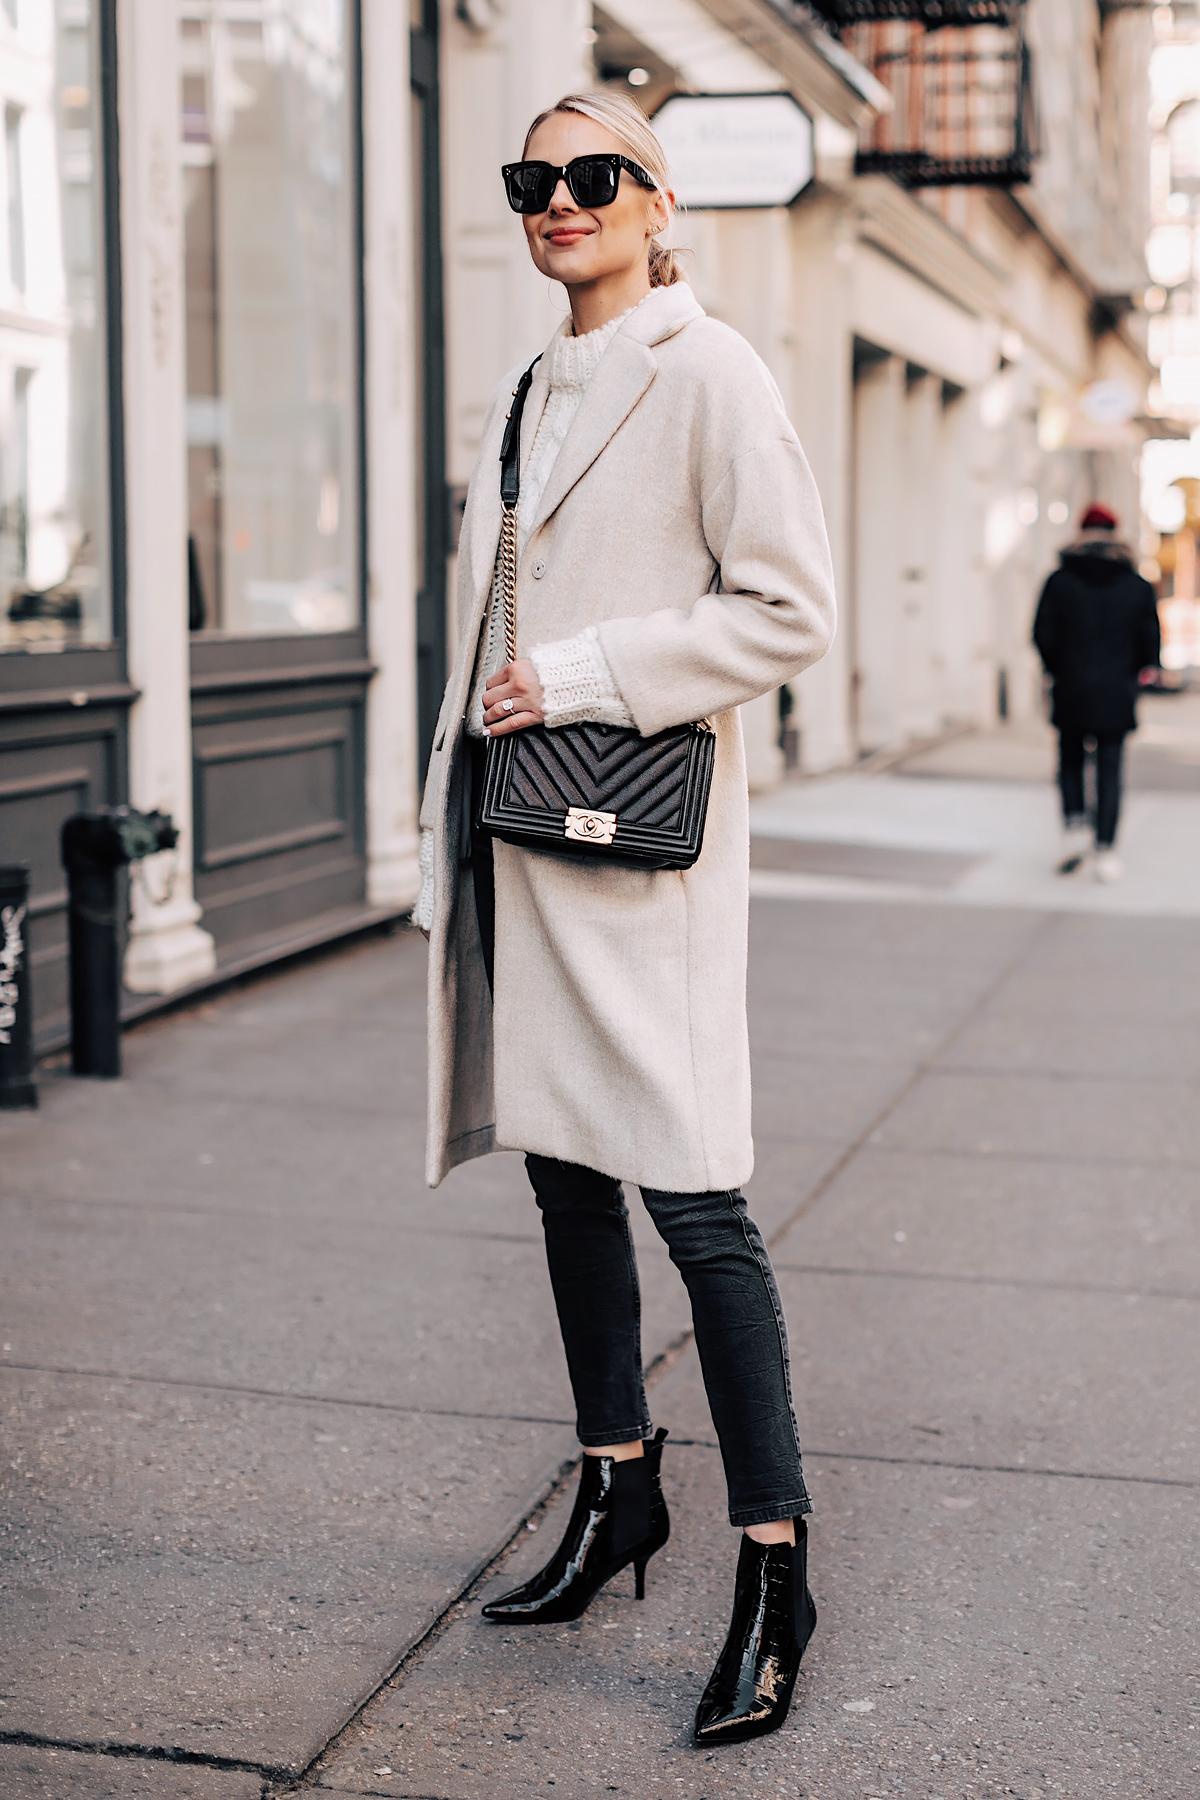 Blonde Woman Wearing White Knit Sweater Beige Coat Grey Skinny Jeans Black Ankle Booties Chanel Black Boy Bag Fashion Jackson Fashion Blogger NYFW Street Style